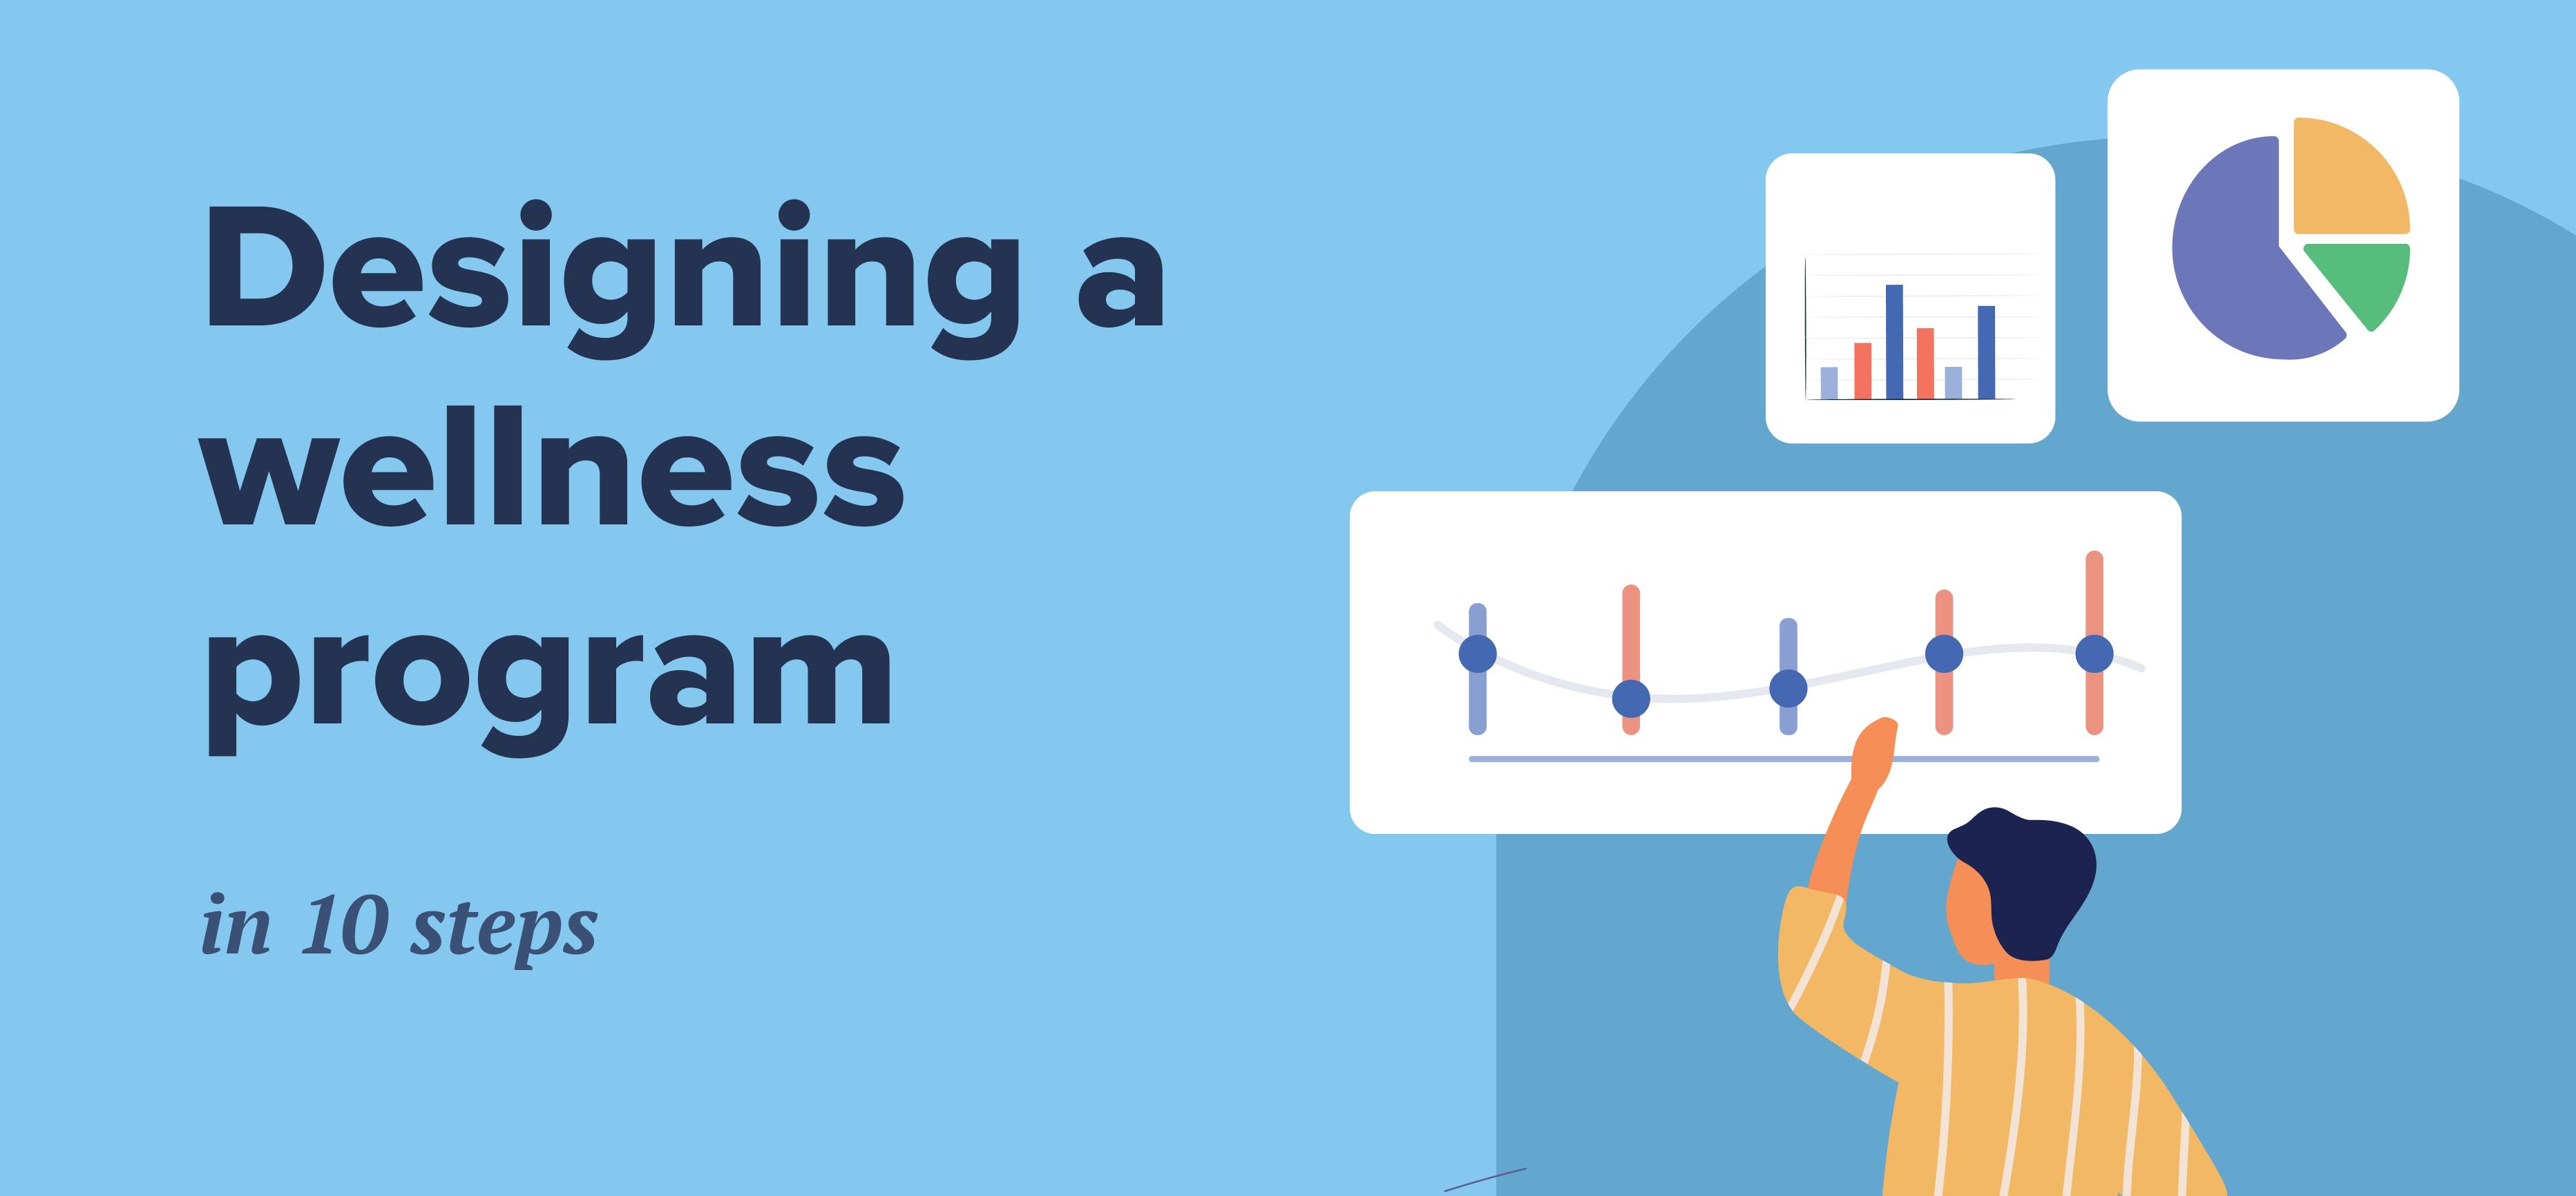 10 Steps in designing a wellness program